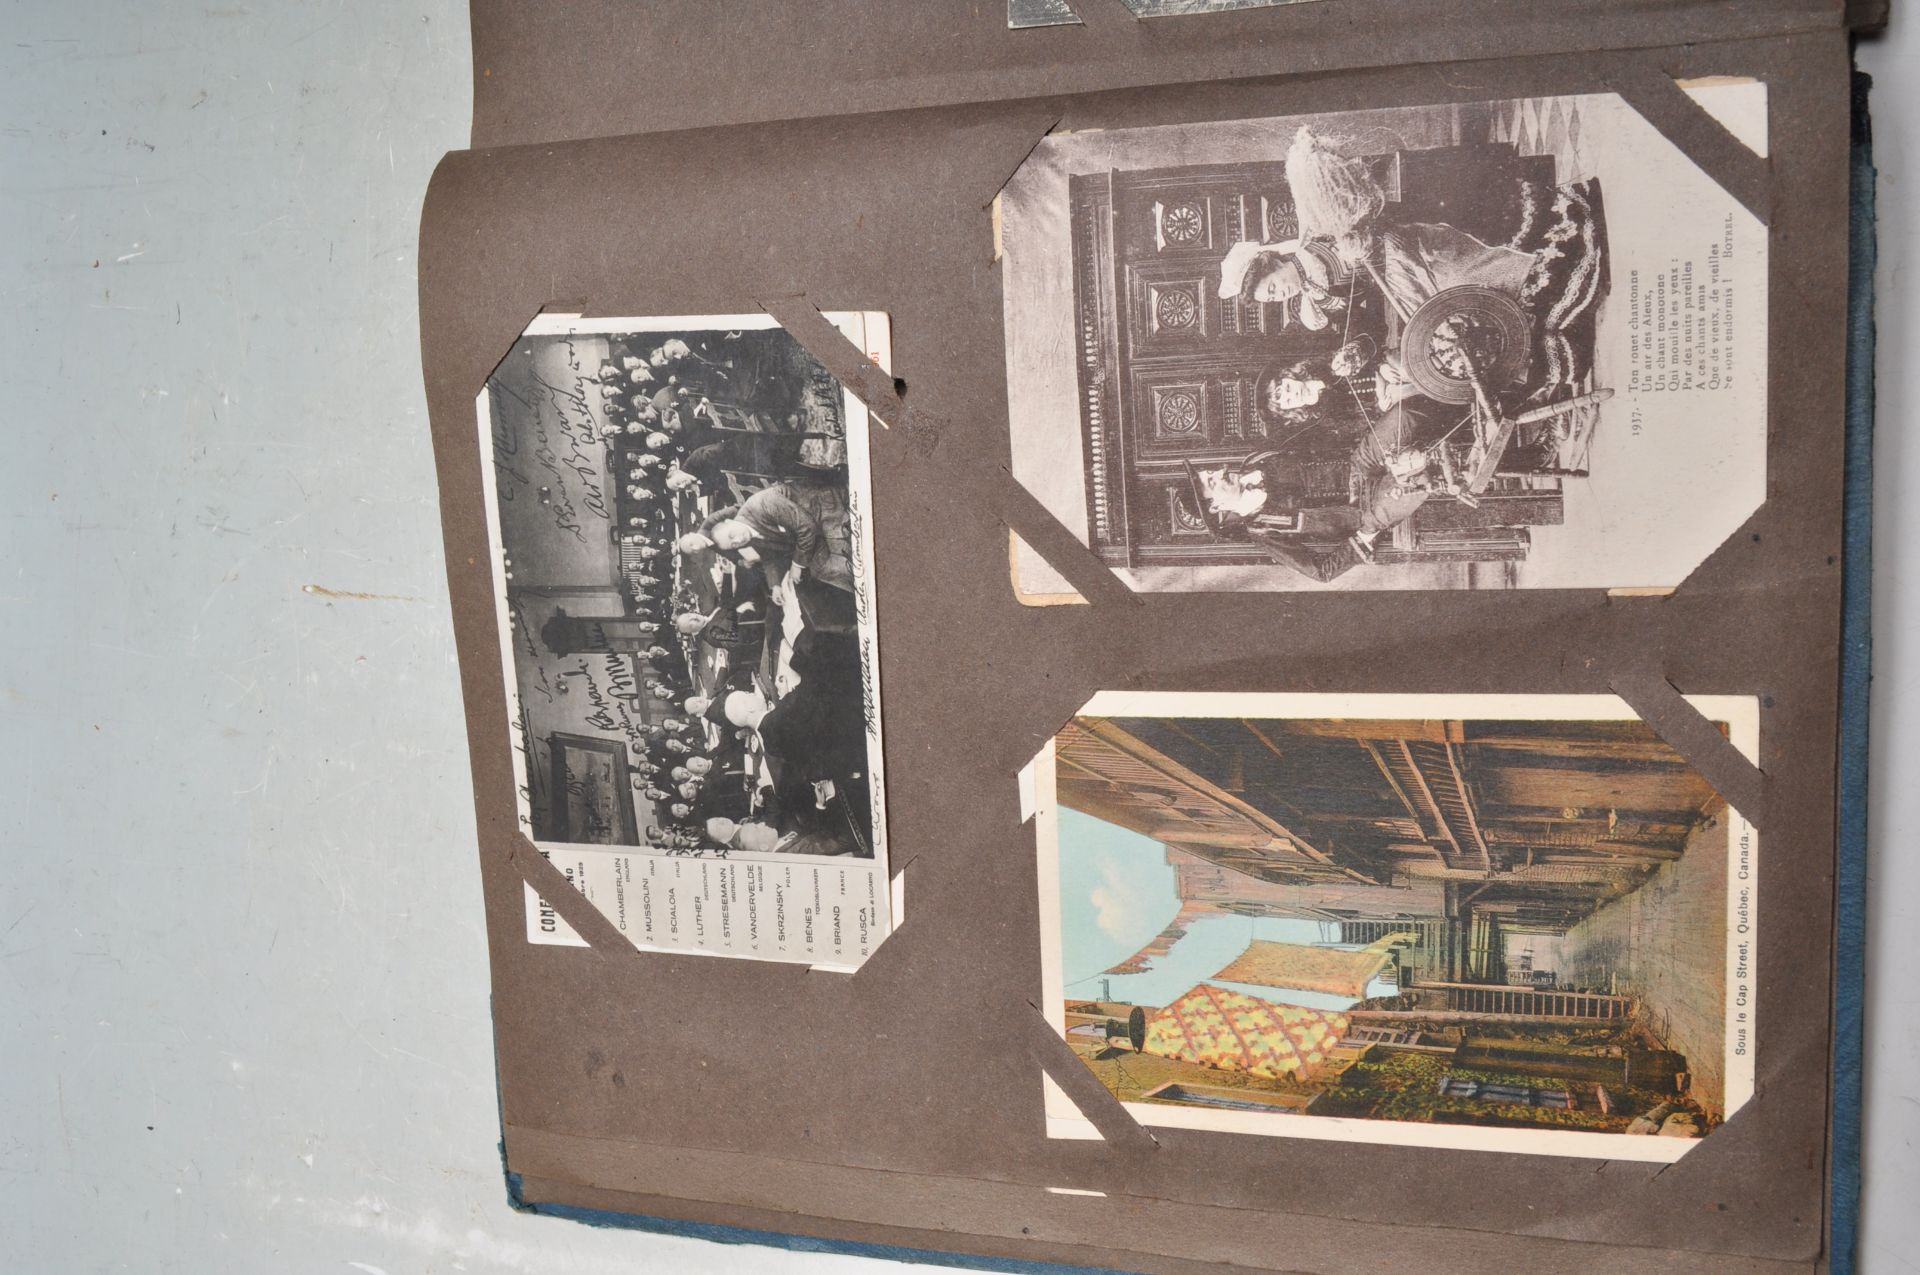 ALBUM OF FOREIGN POSTCARDS - ALL CIRCA WW1 PERIOD - Bild 5 aus 23